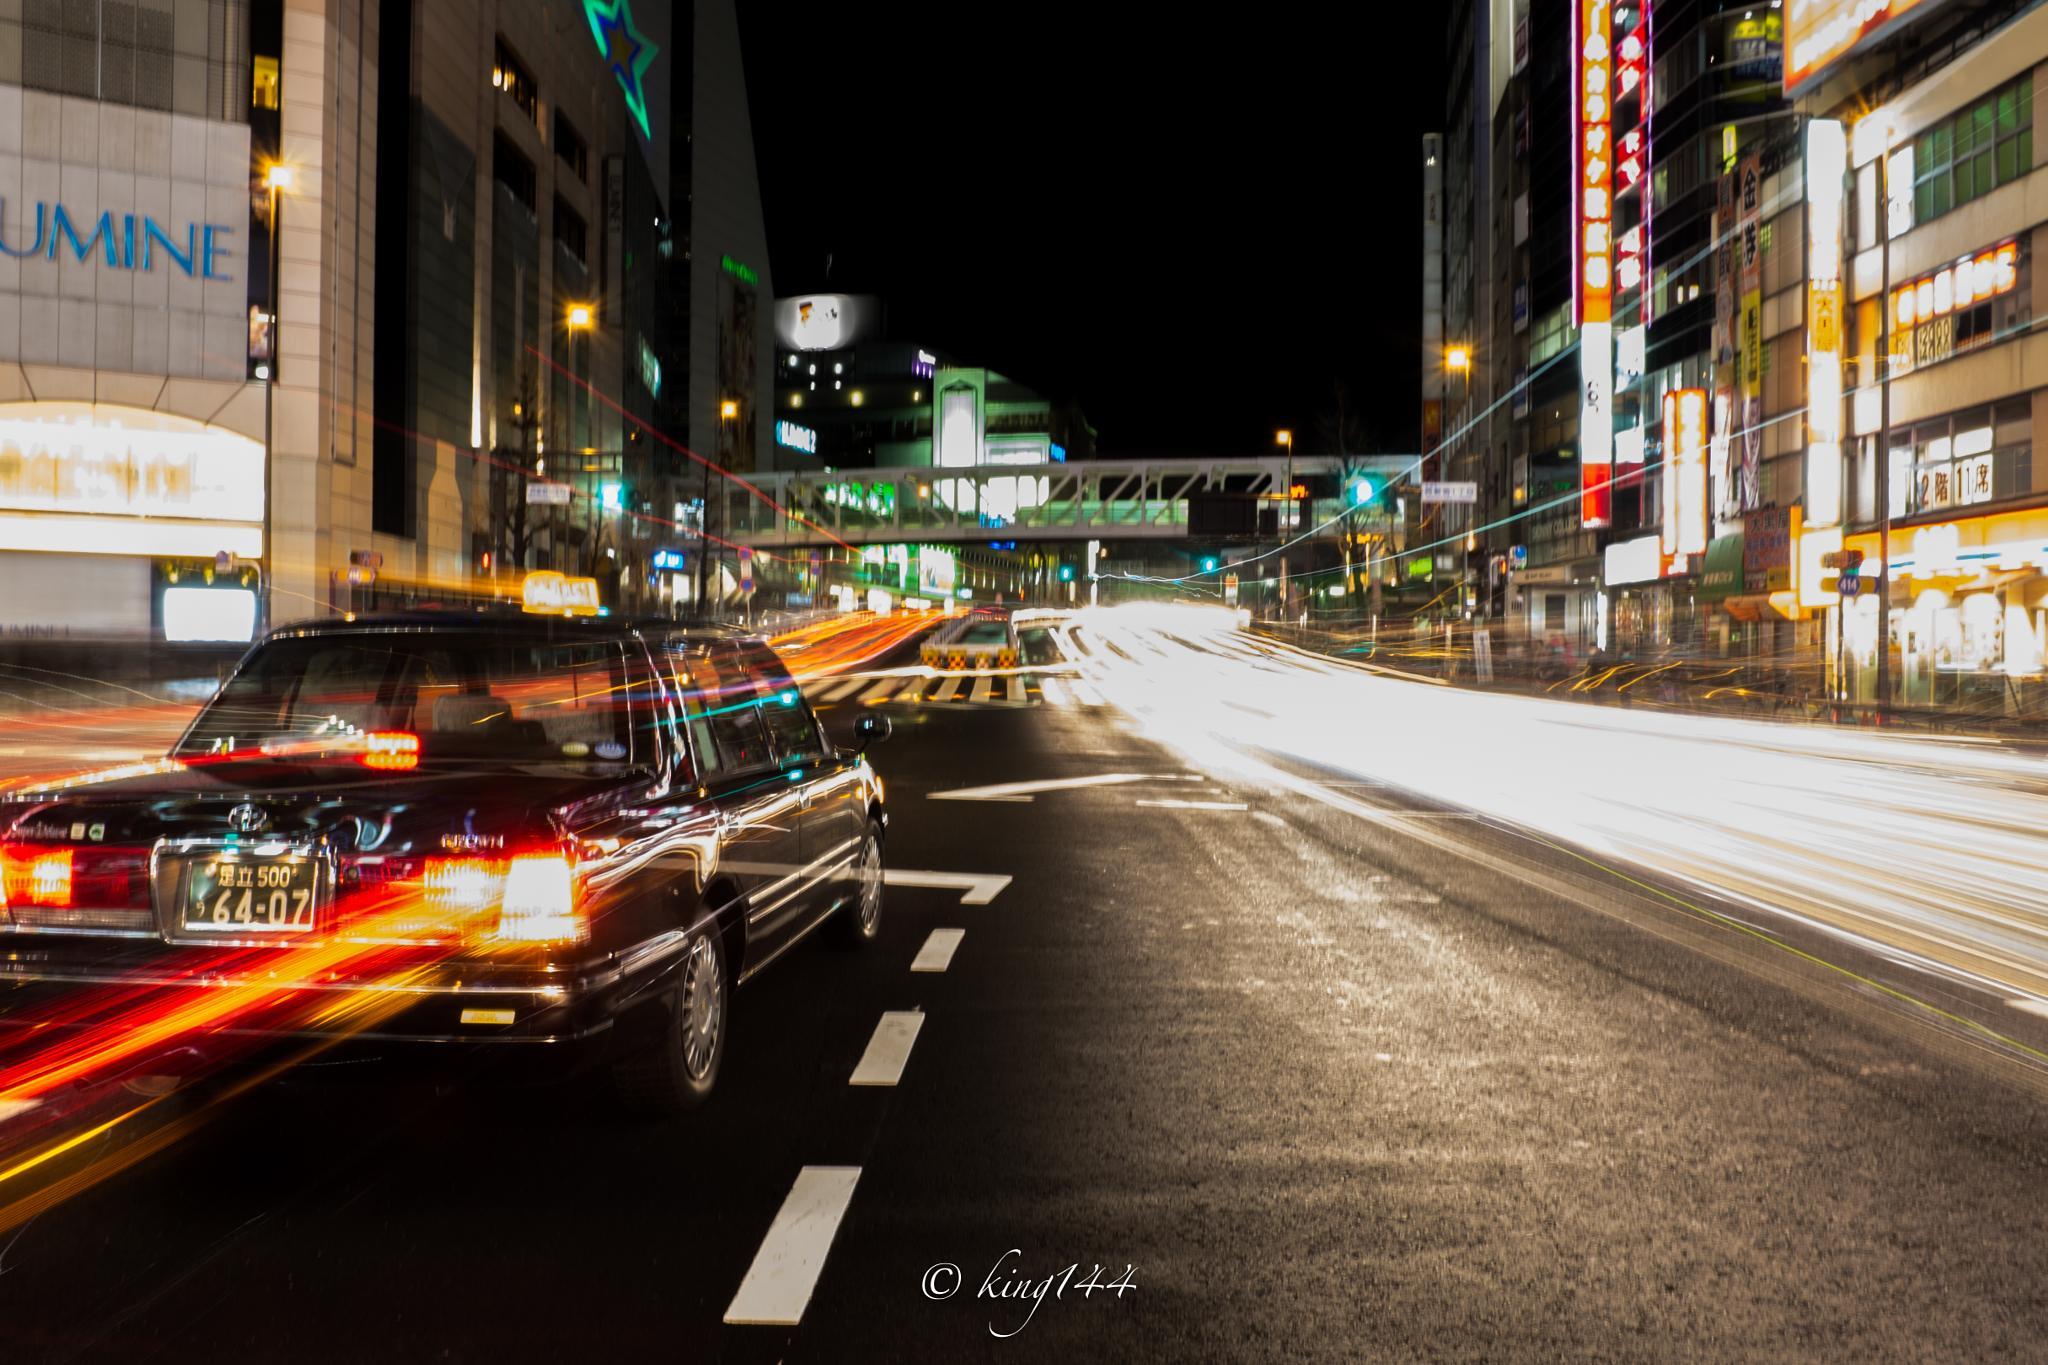 tokyo taxi by praphab